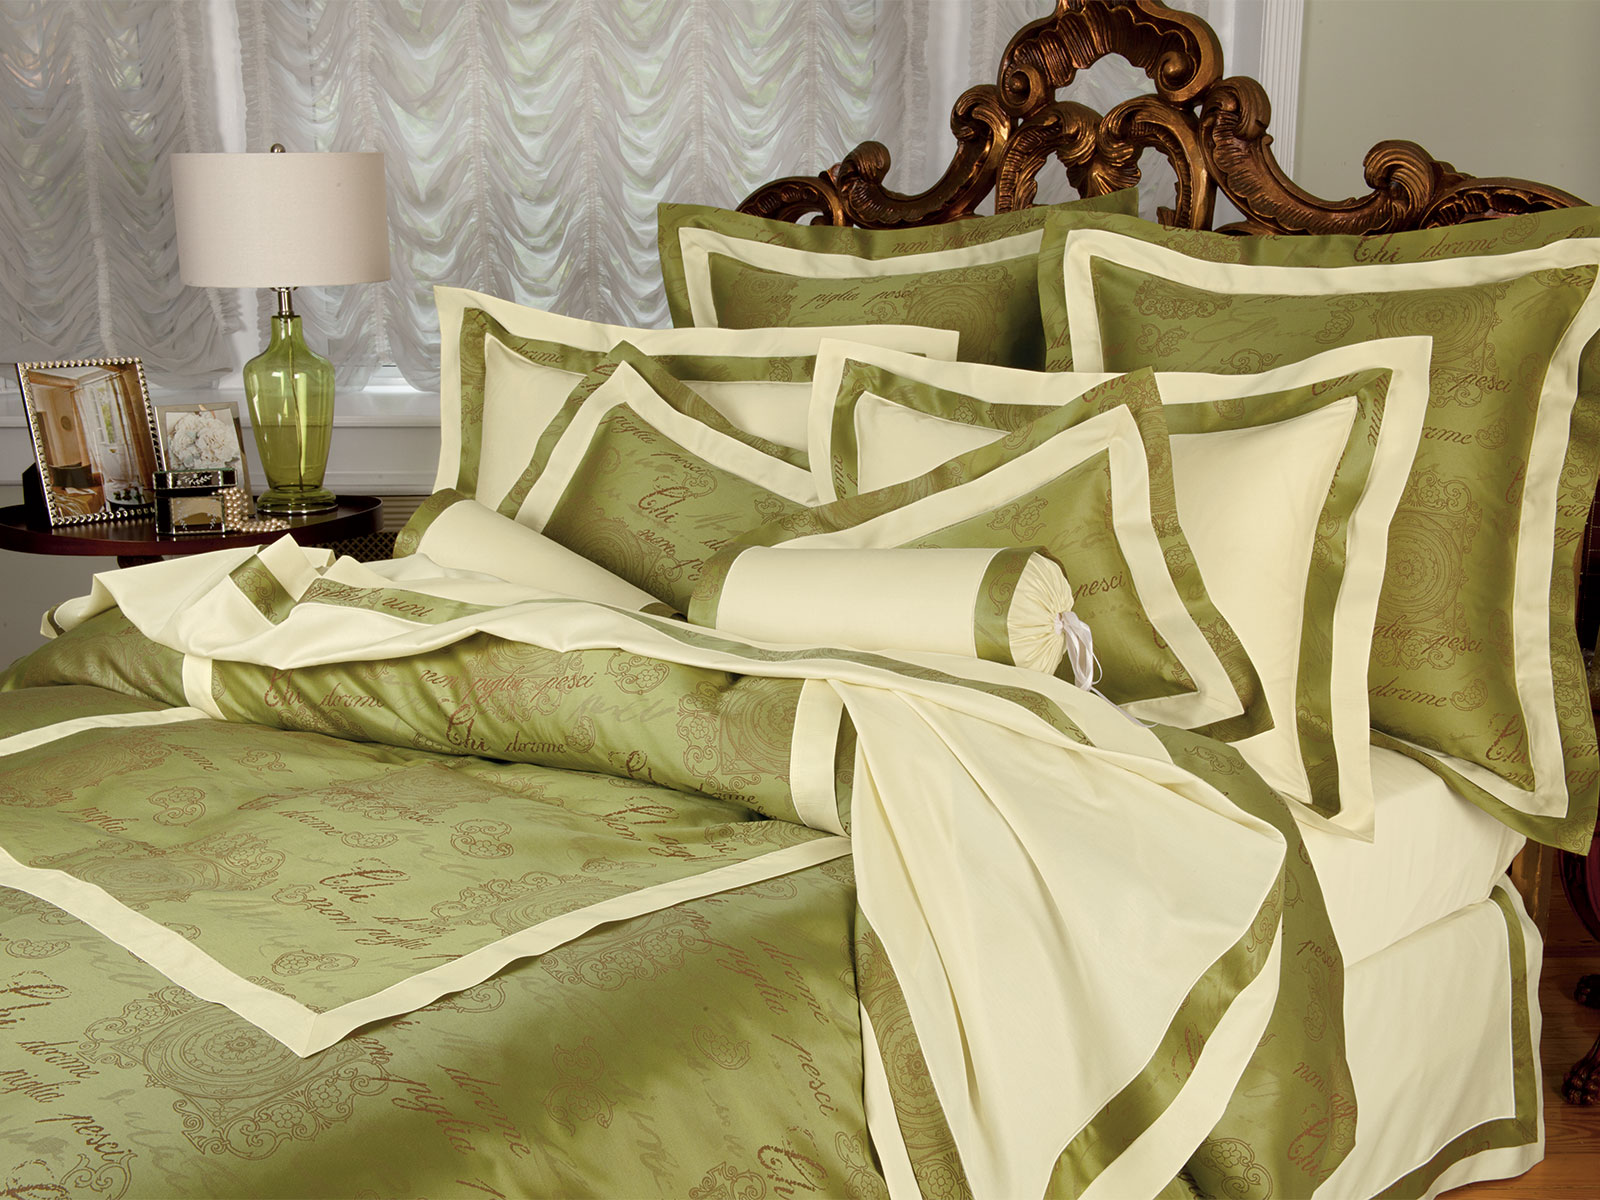 Buona Notte Luxury Bedding Italian Bed Linens